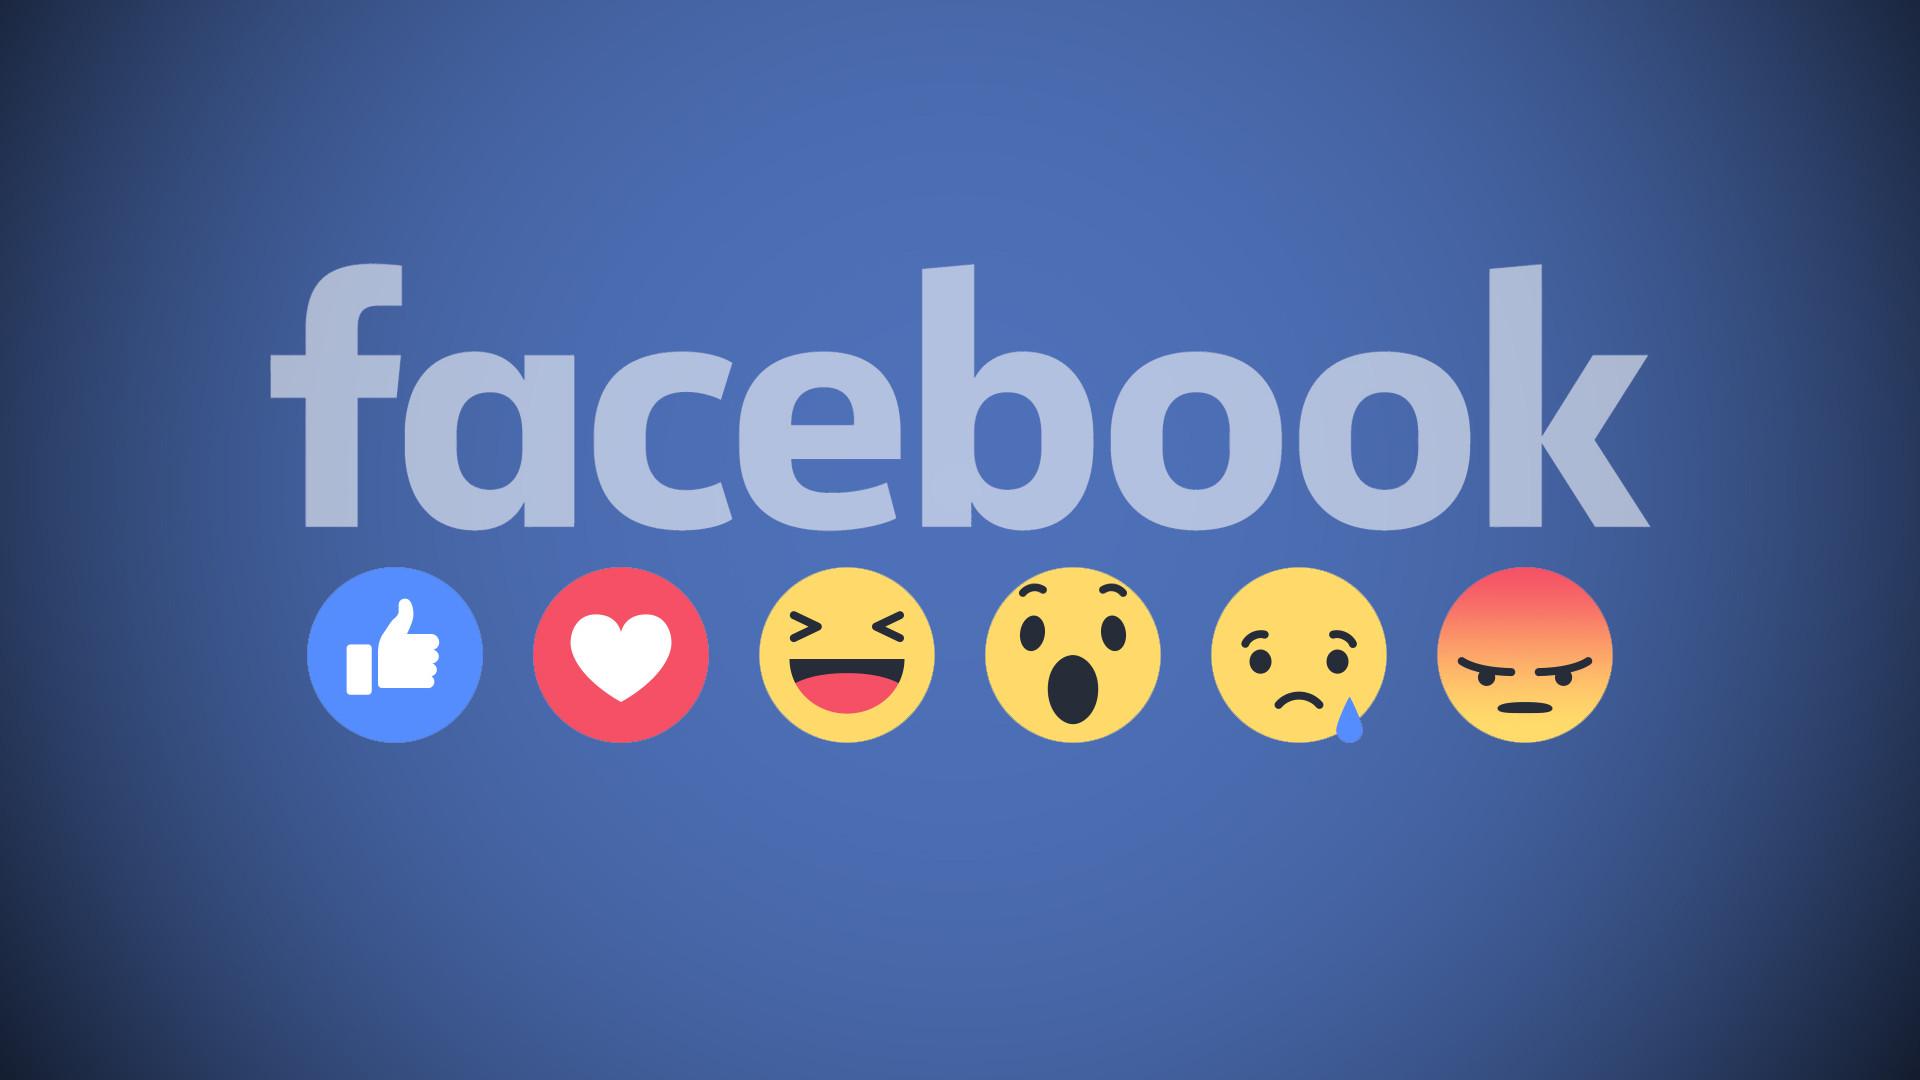 facebook emotions wallpaper 68945